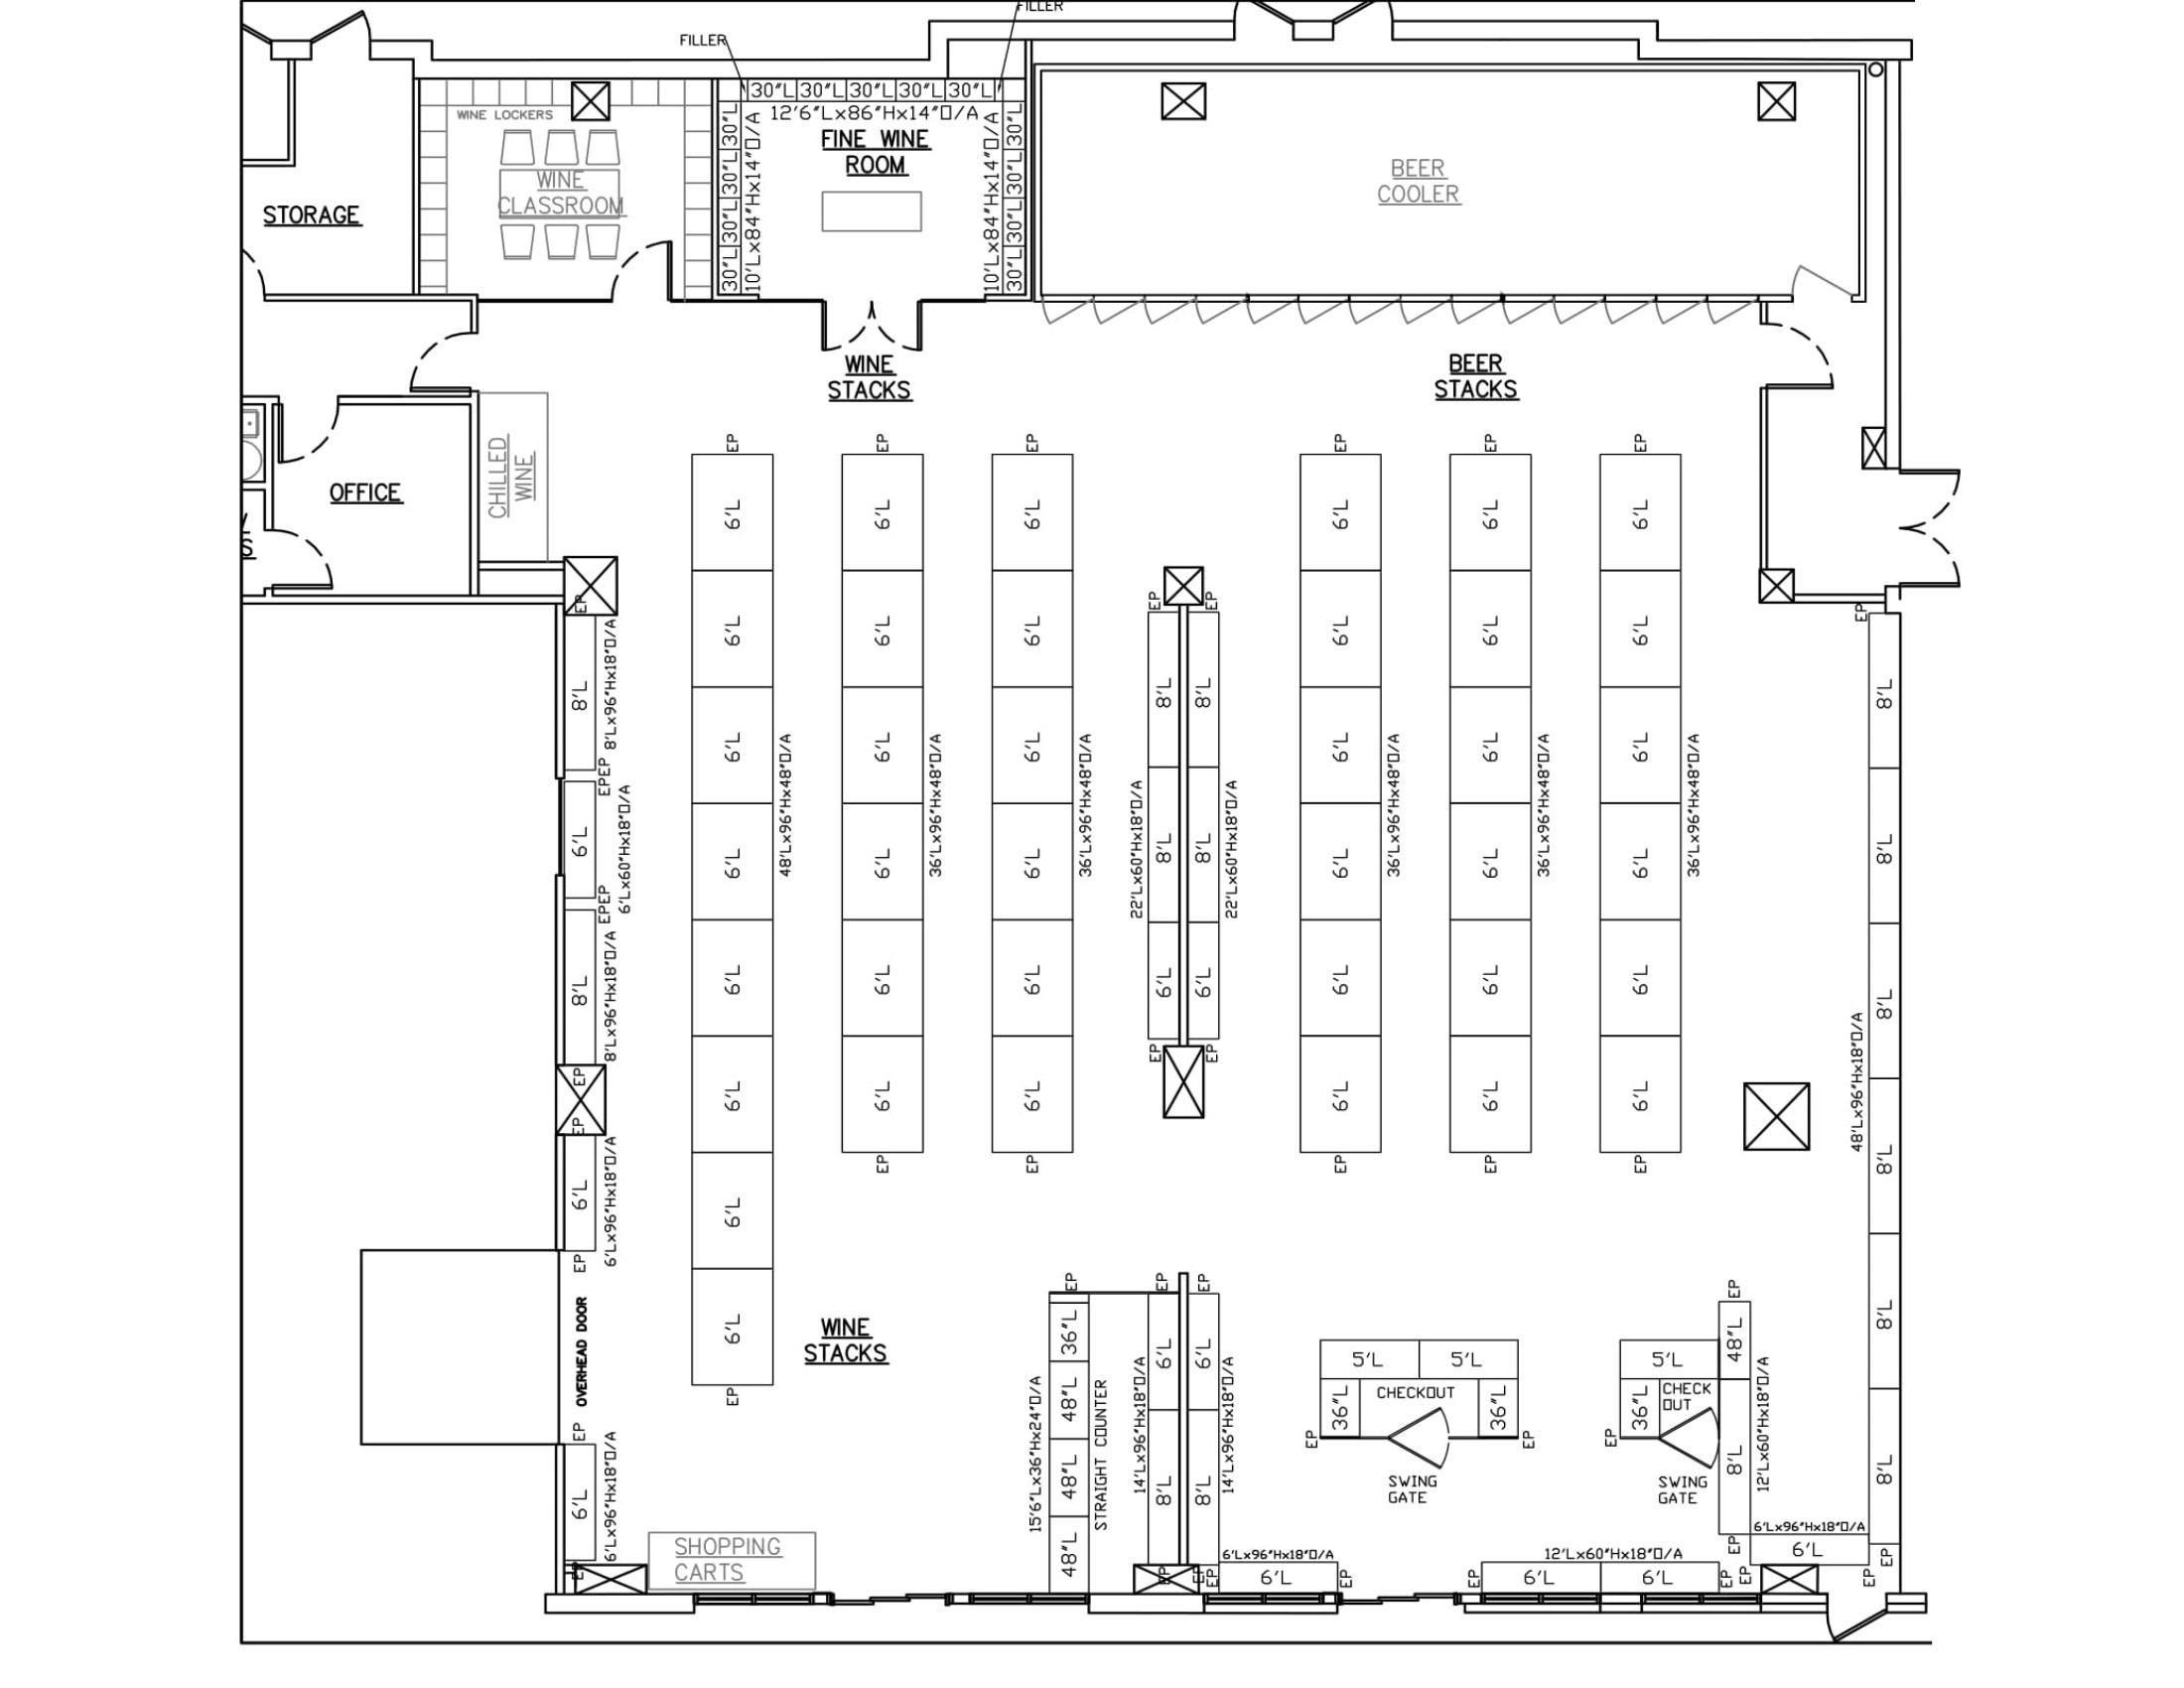 Liquor Store Fixtures & Displays Liquor Store Design